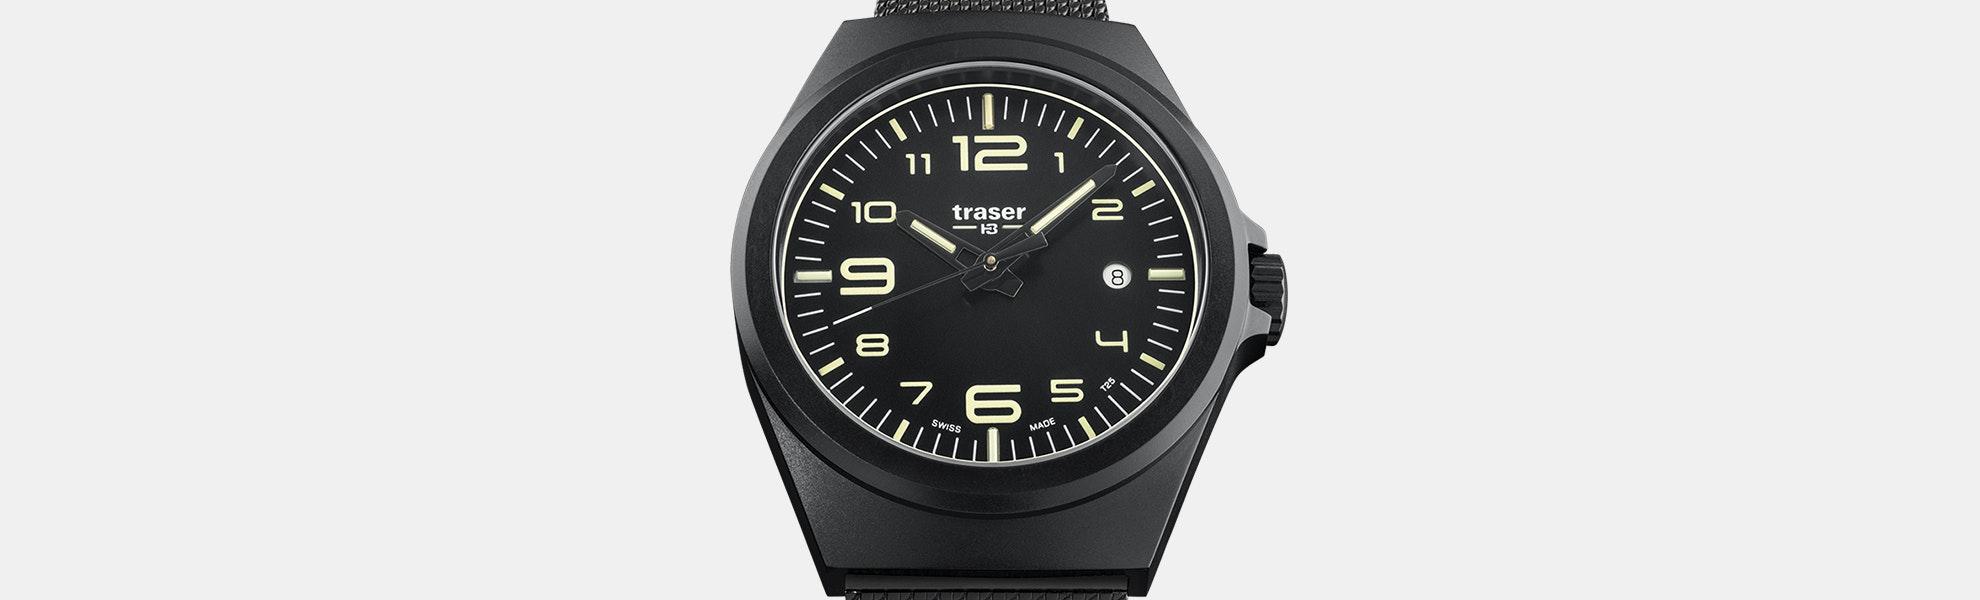 Traser P59 Essential Quartz Watch